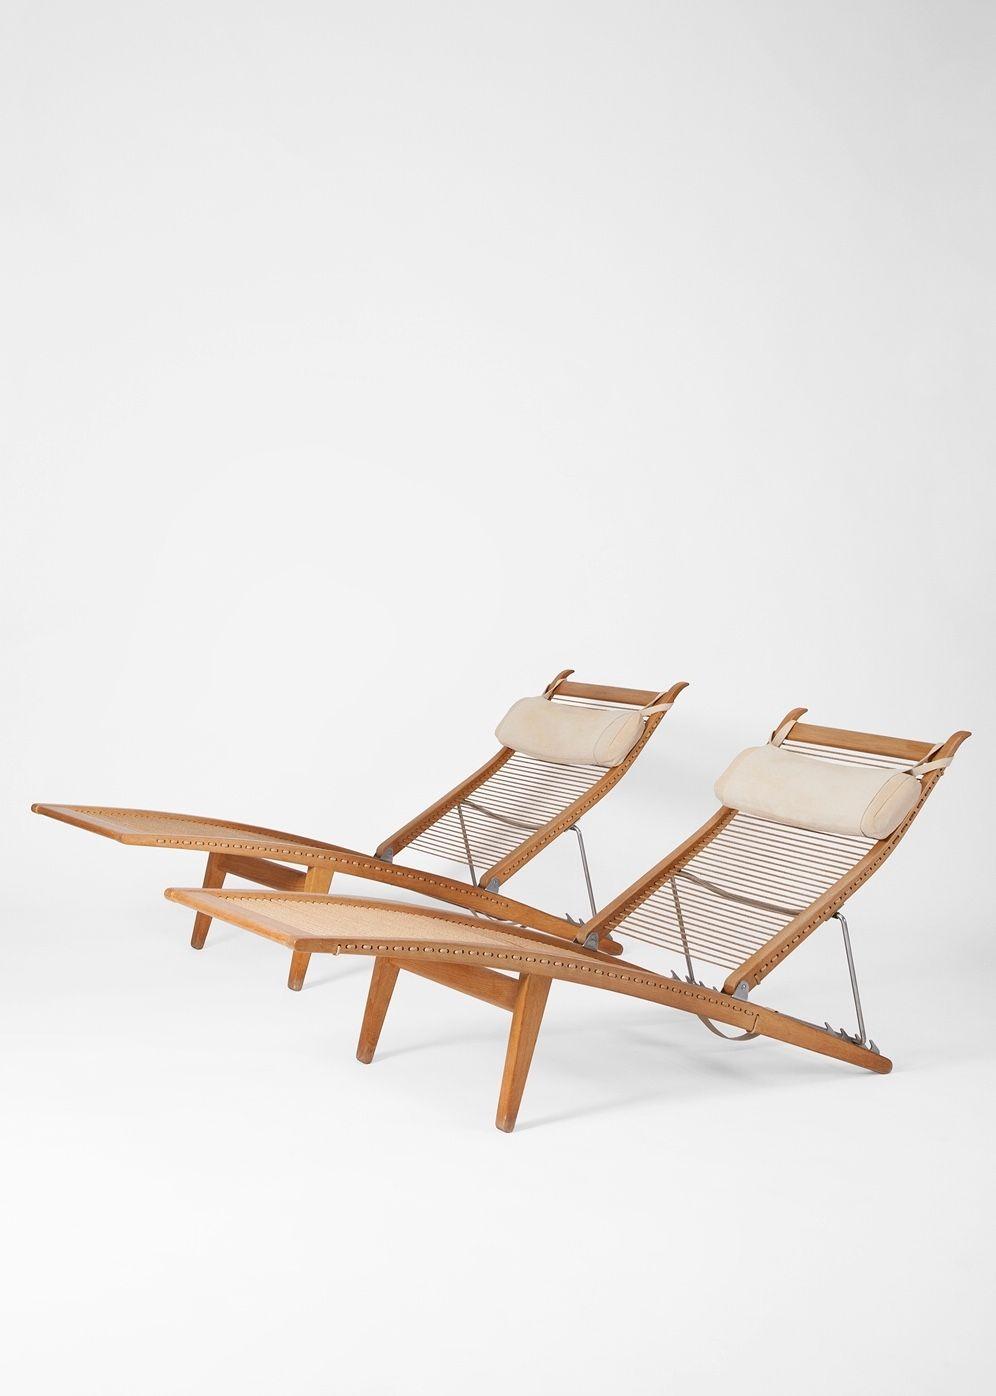 Møbelkunst Gallery Chairs 1958Dansk Hans JWegner Deck JFTKc3ul1